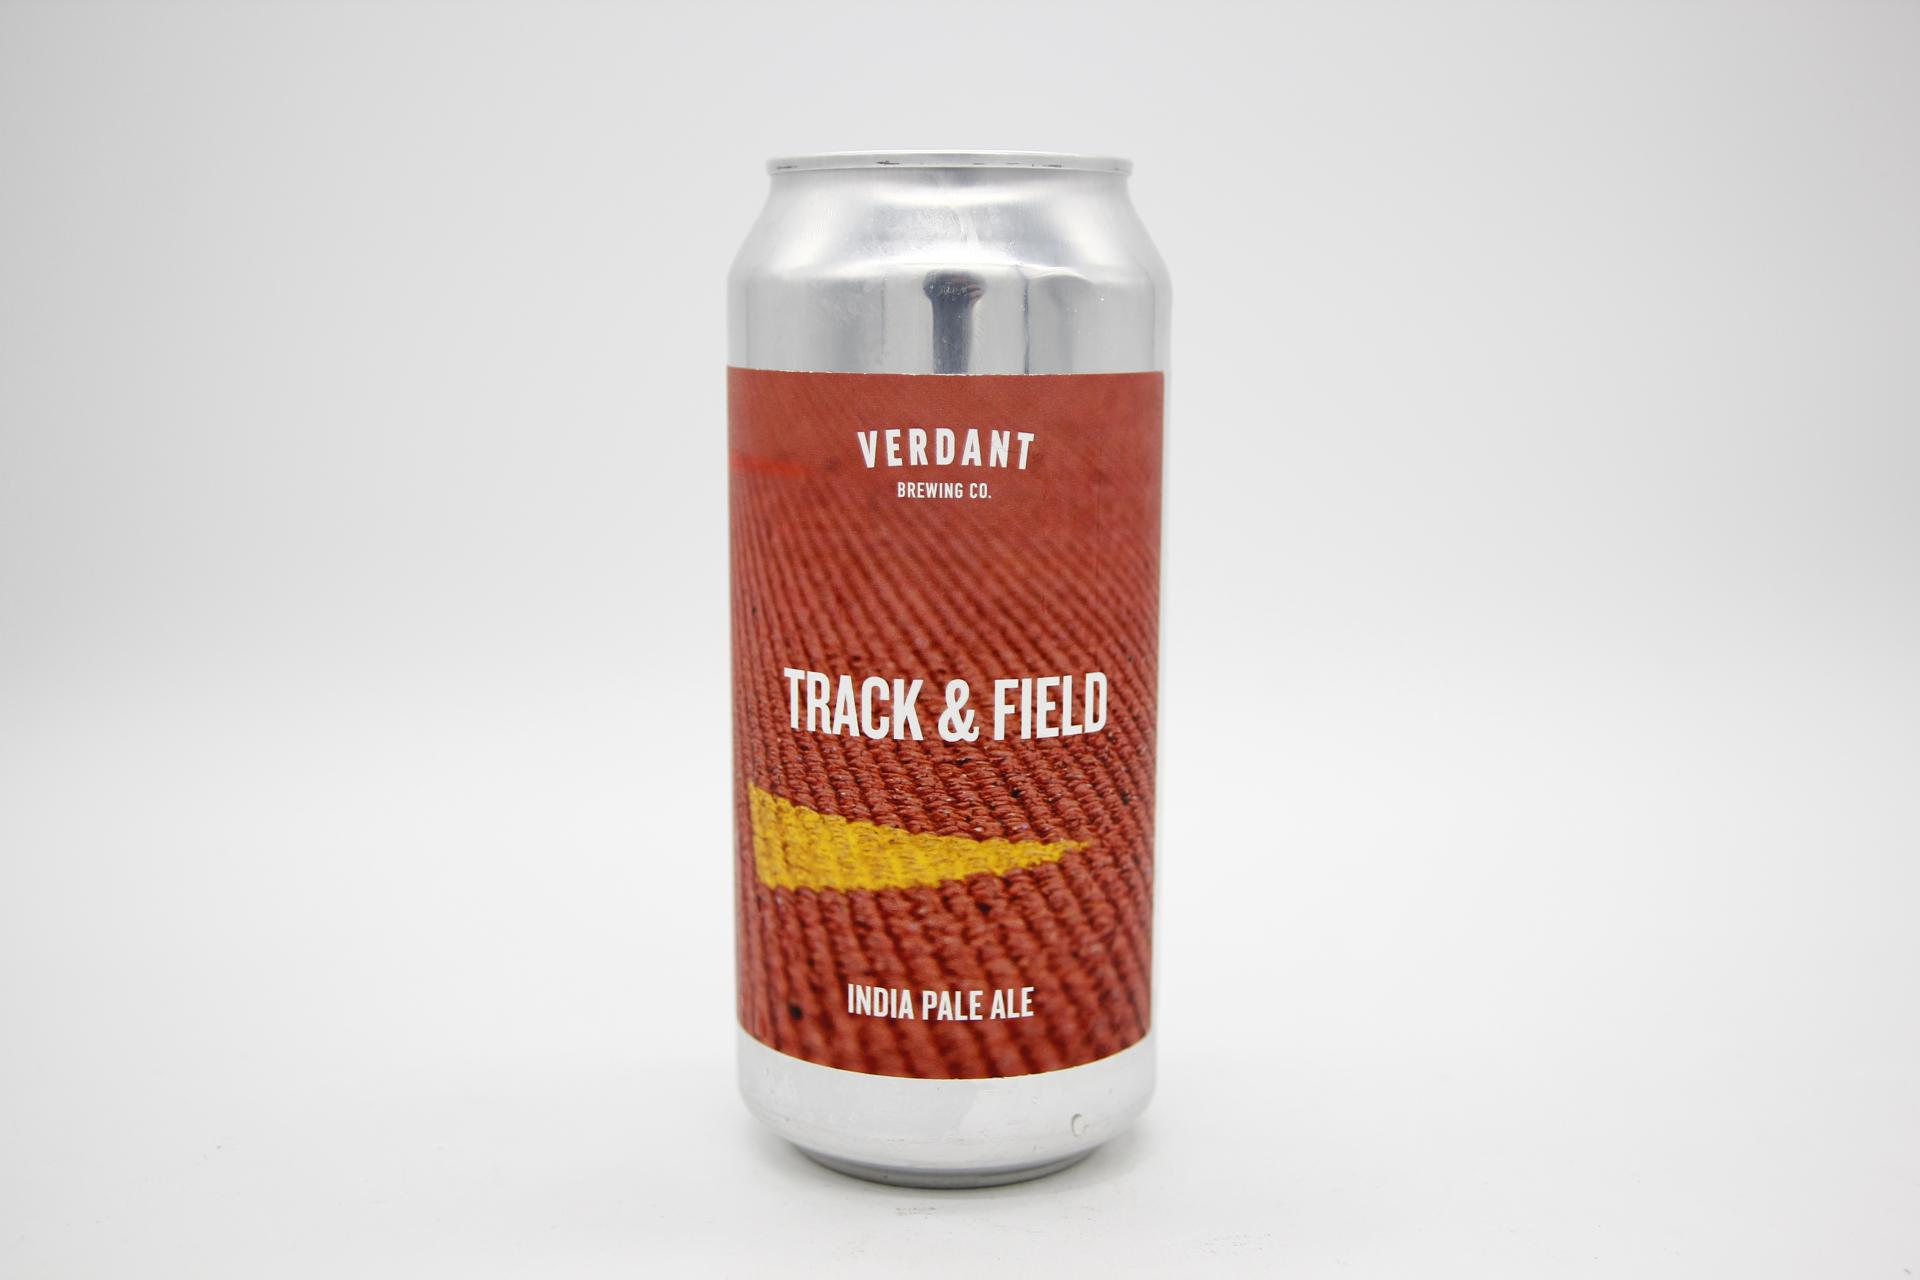 VERDANT - TRACK & FIELD 44cl